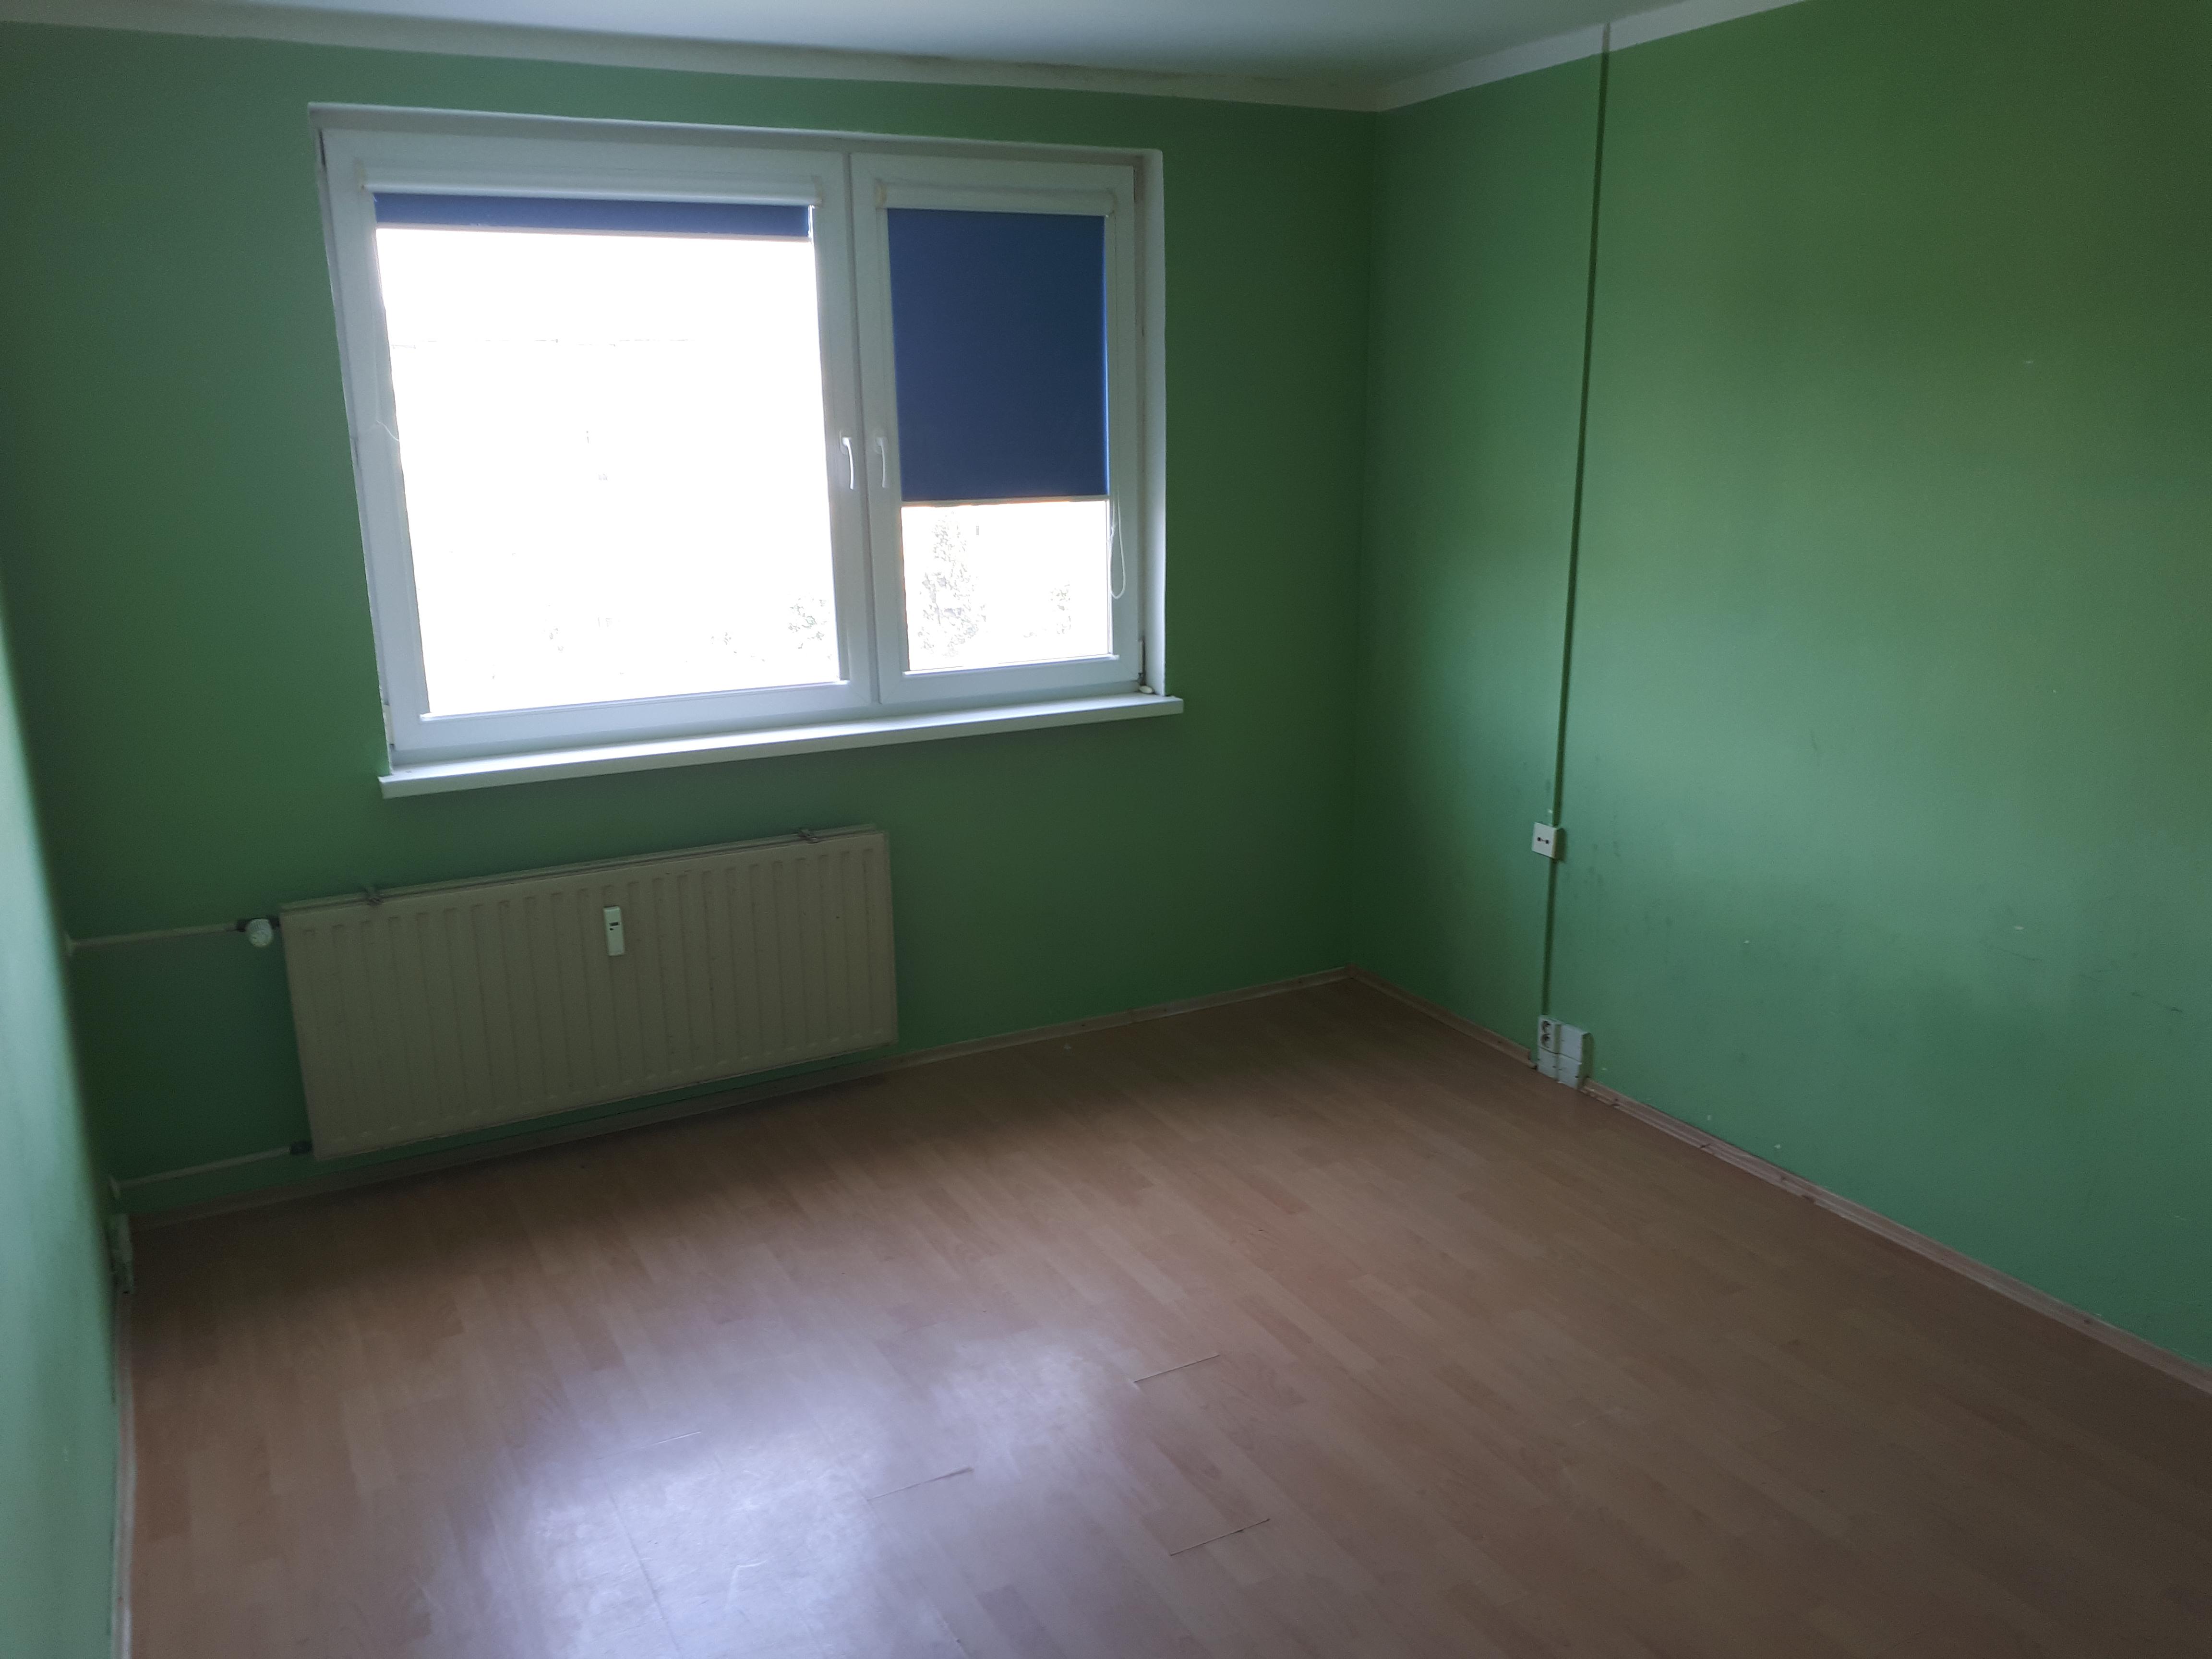 3 izbový byt s balkónom, sídlisko JUH